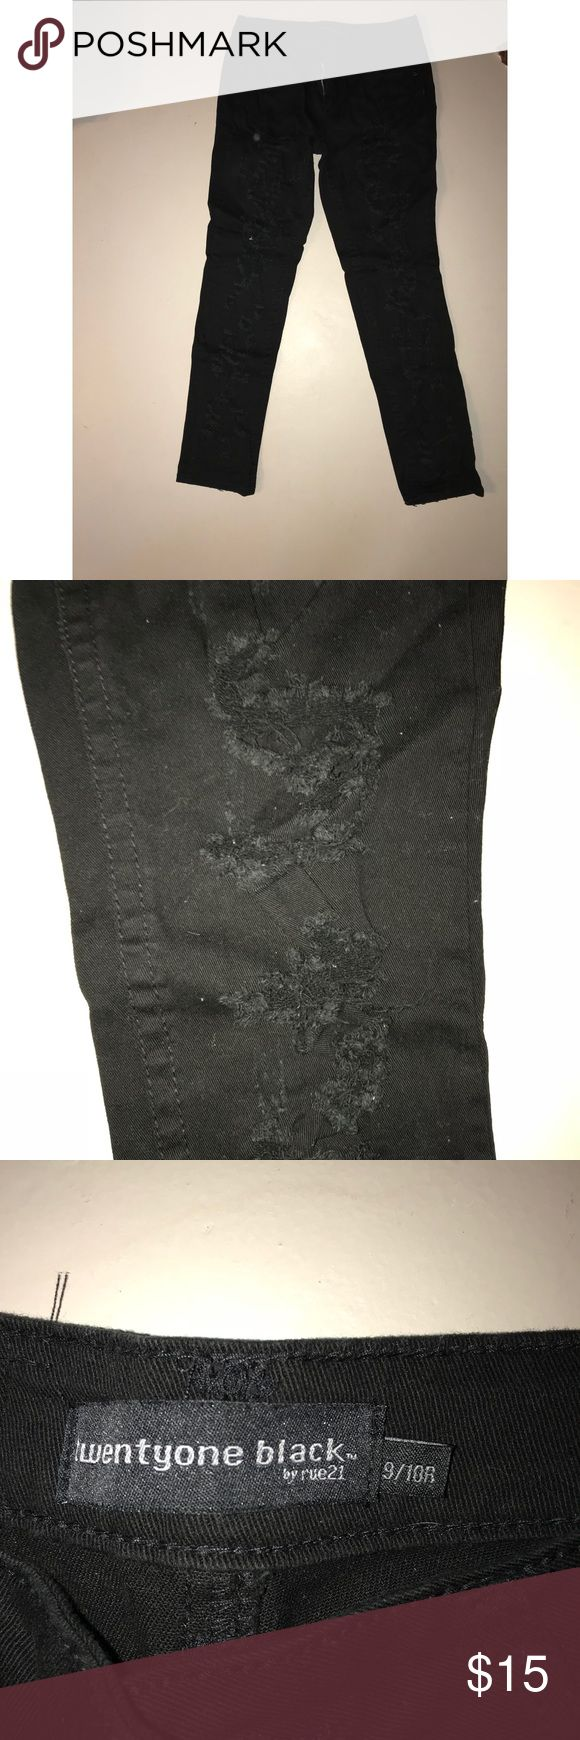 RUE21 BLACK HOLEY JEANS. SIZE 9/10 Rue21 Black skinny holey jeans. Size 9/10. Rue21 Pants Skinny